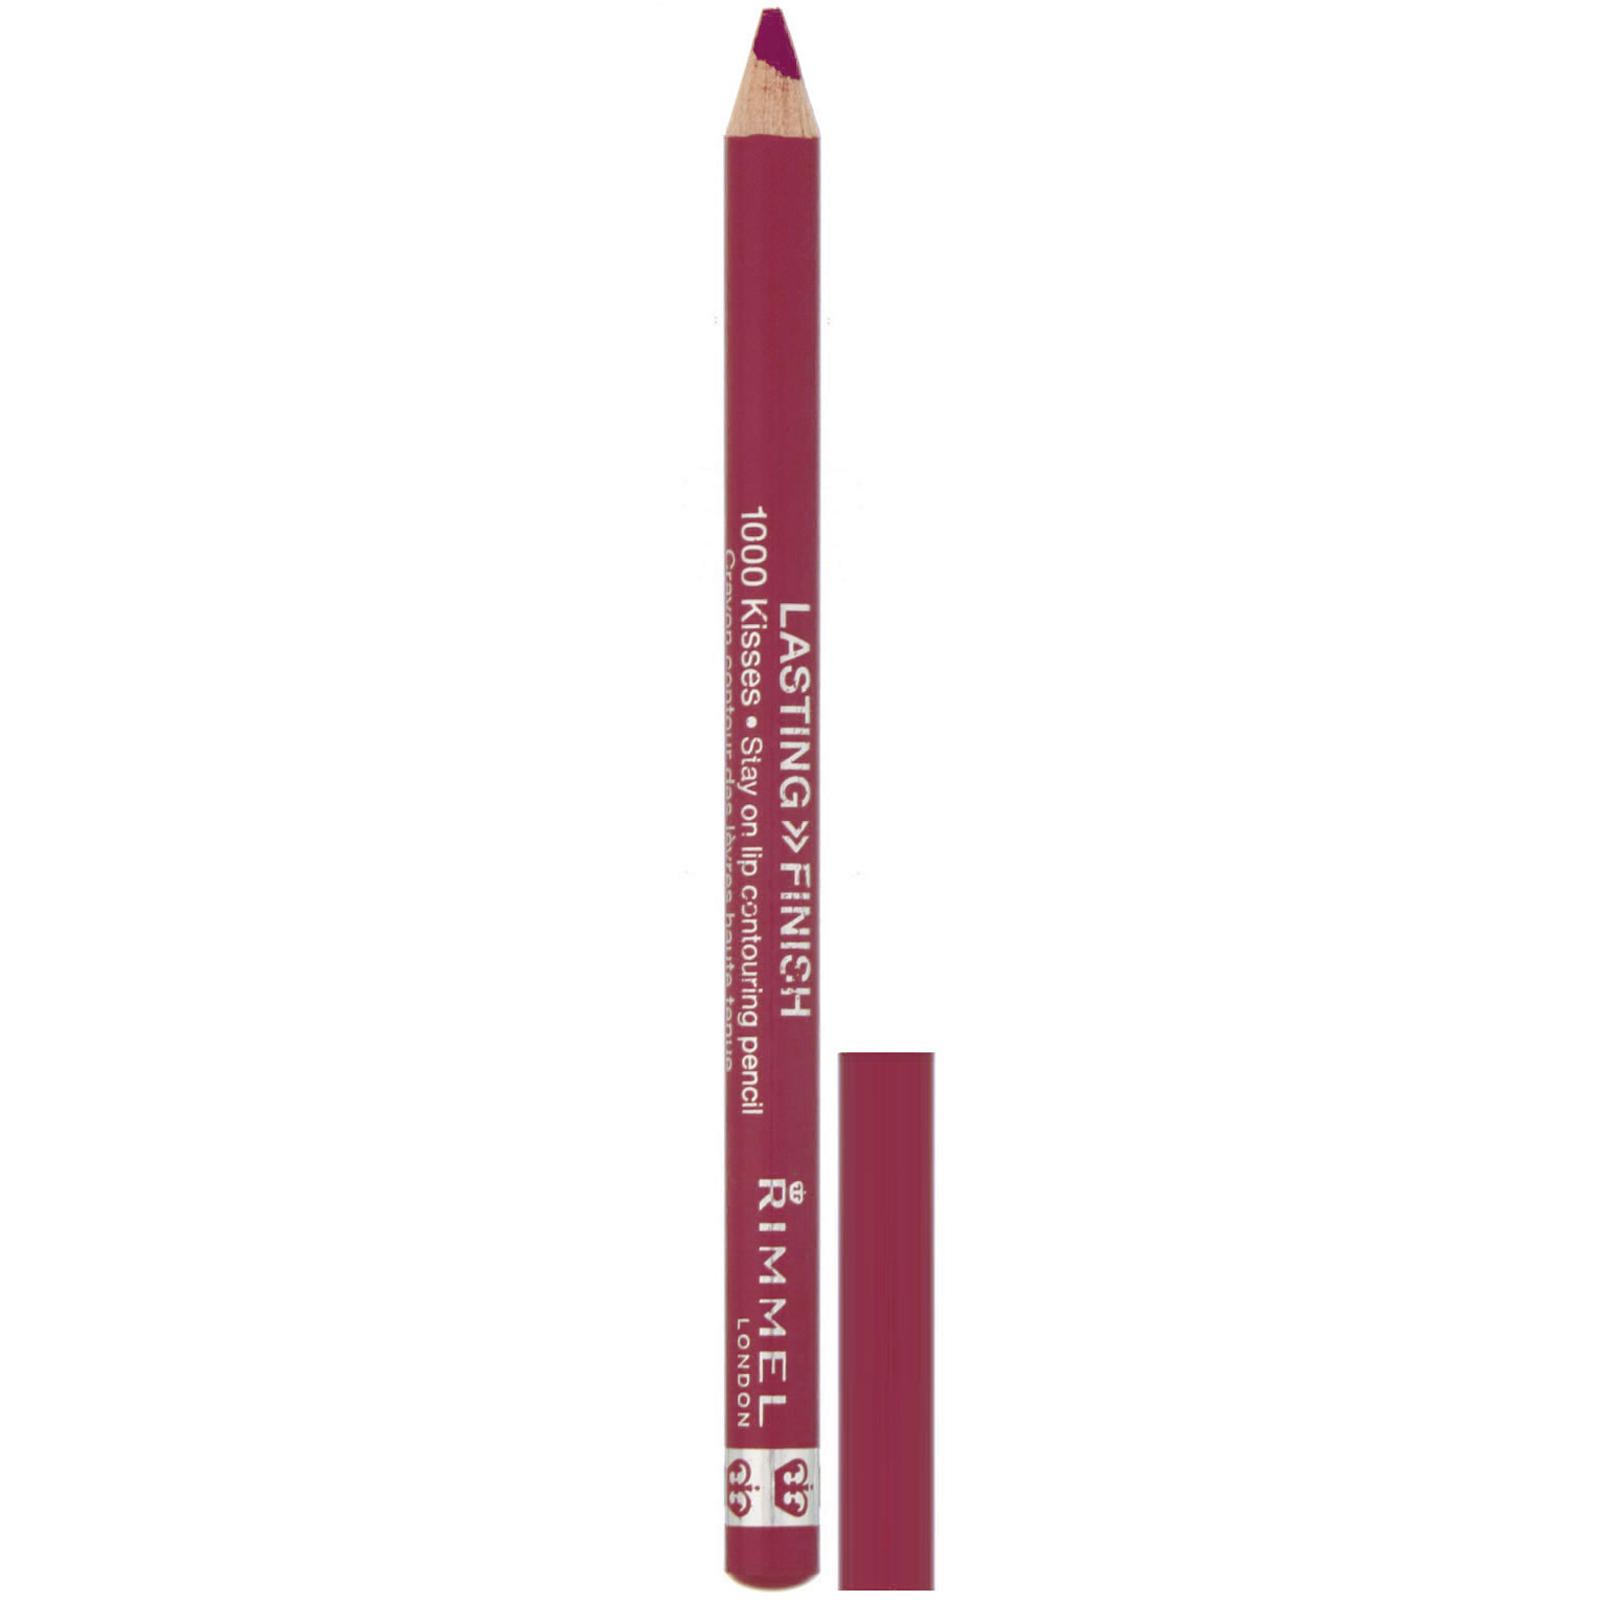 Rimmel London, Lasting Finish, 1000 Kisses Stay On, контурный карандаш для губ, оттенок 004 «Розовый», 1,2 г